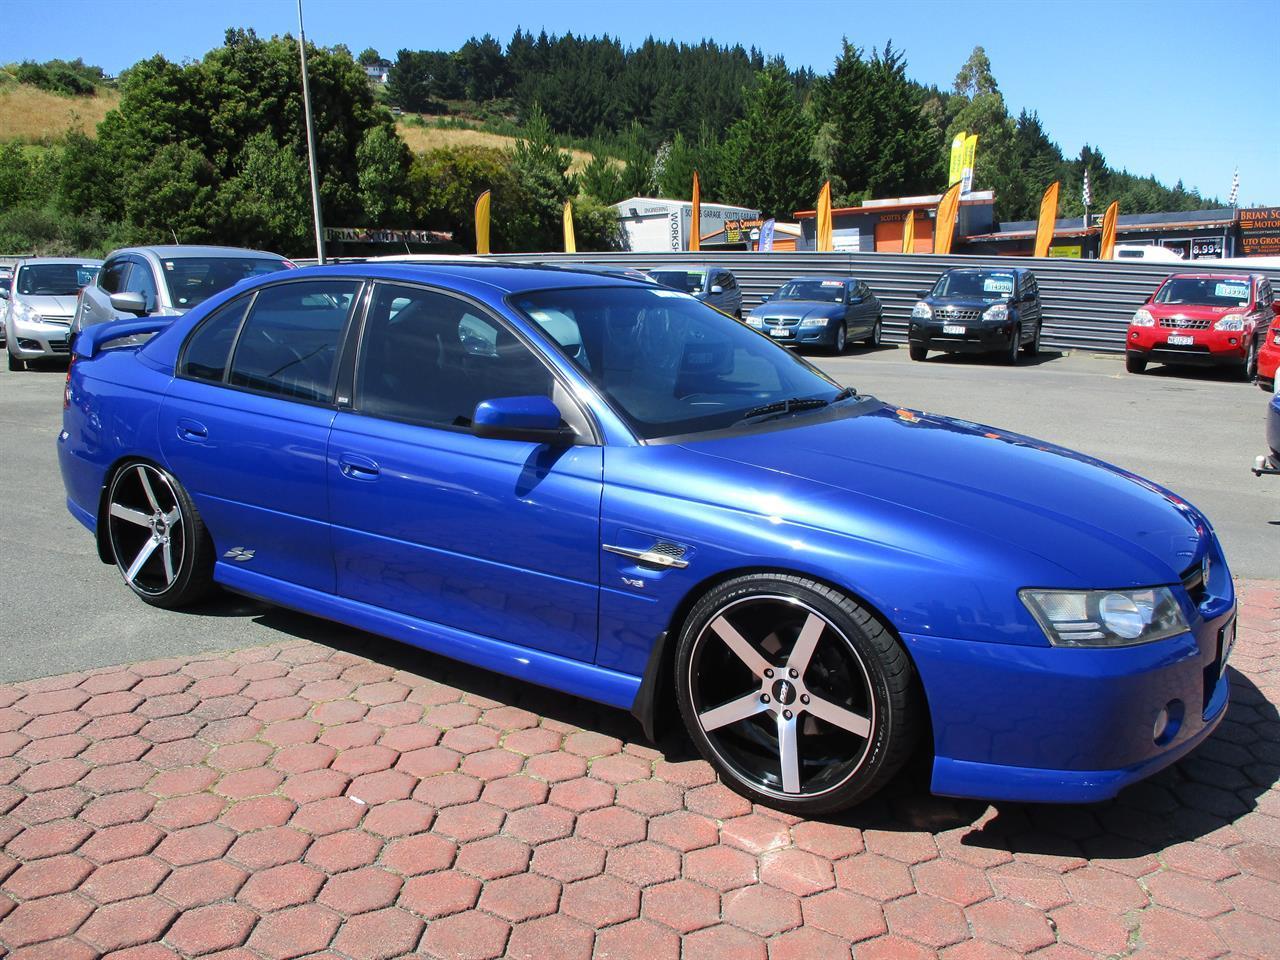 image-2, 2005 Holden Commodore VZ SS at Dunedin